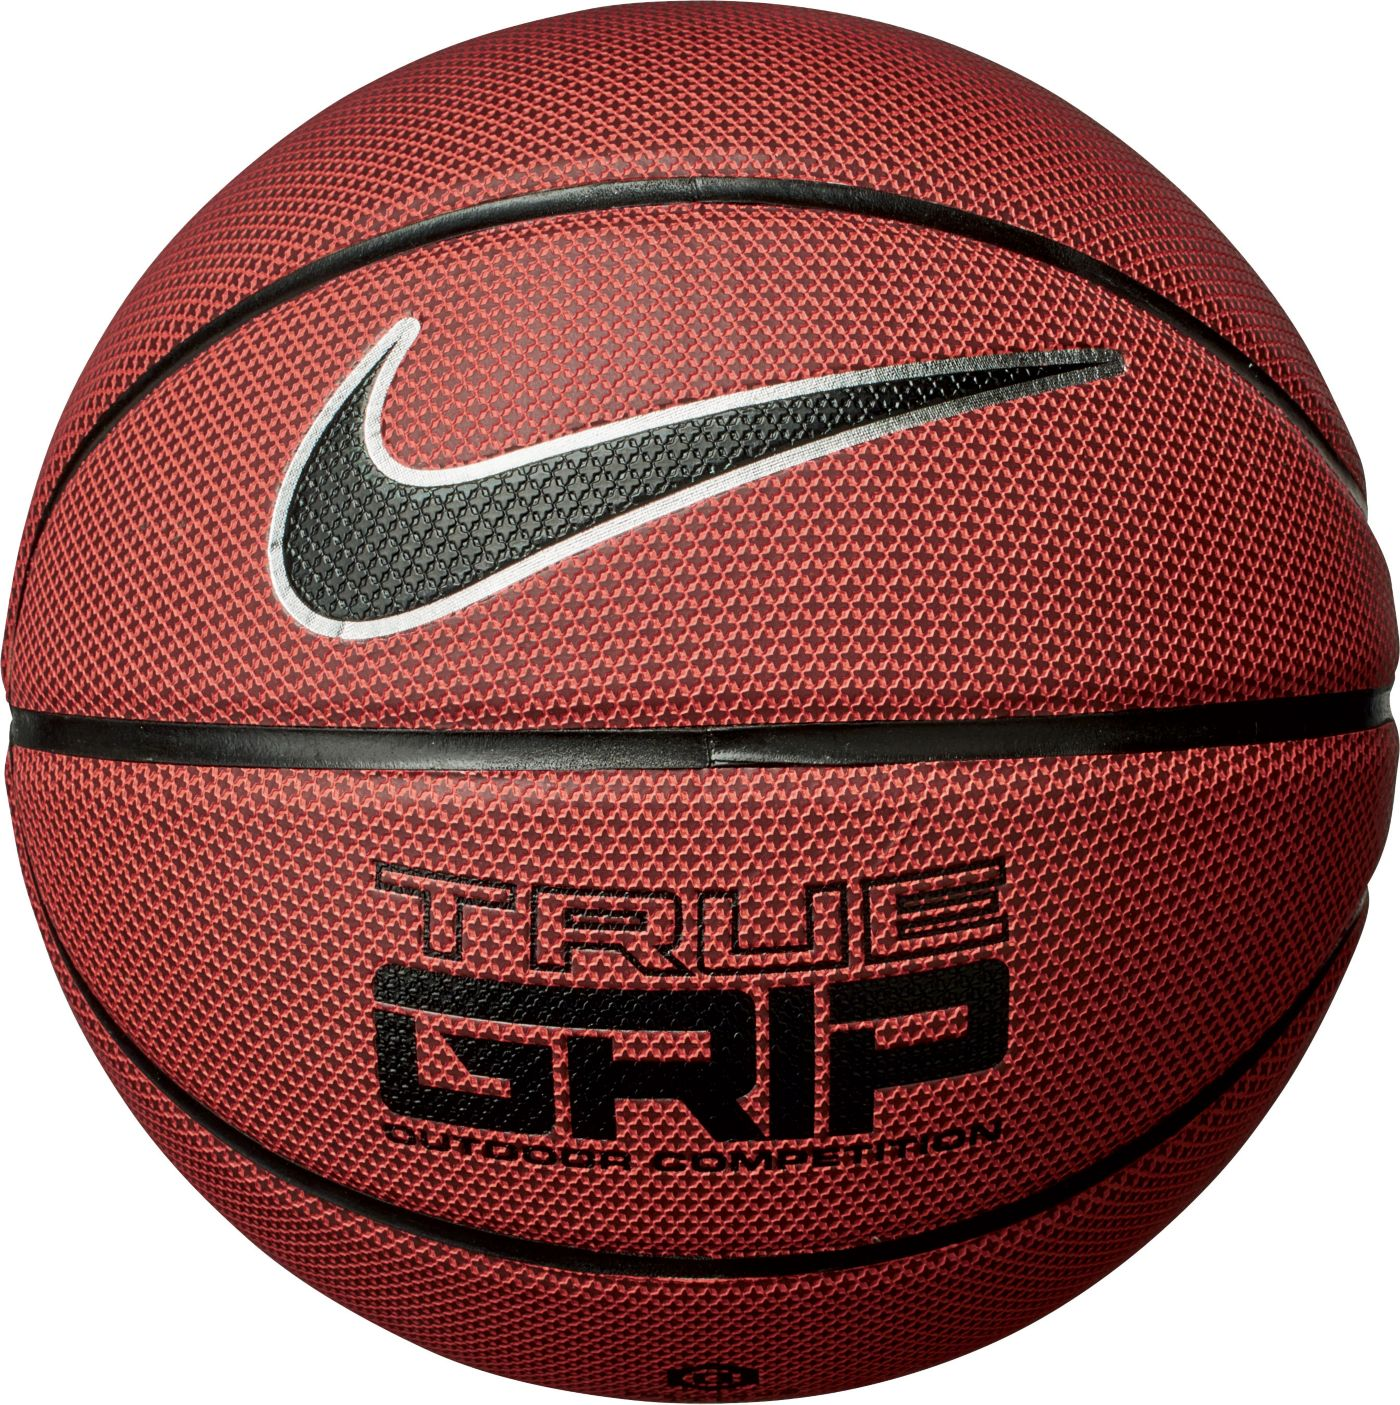 Nike True Grip Youth Basketball (27.5)